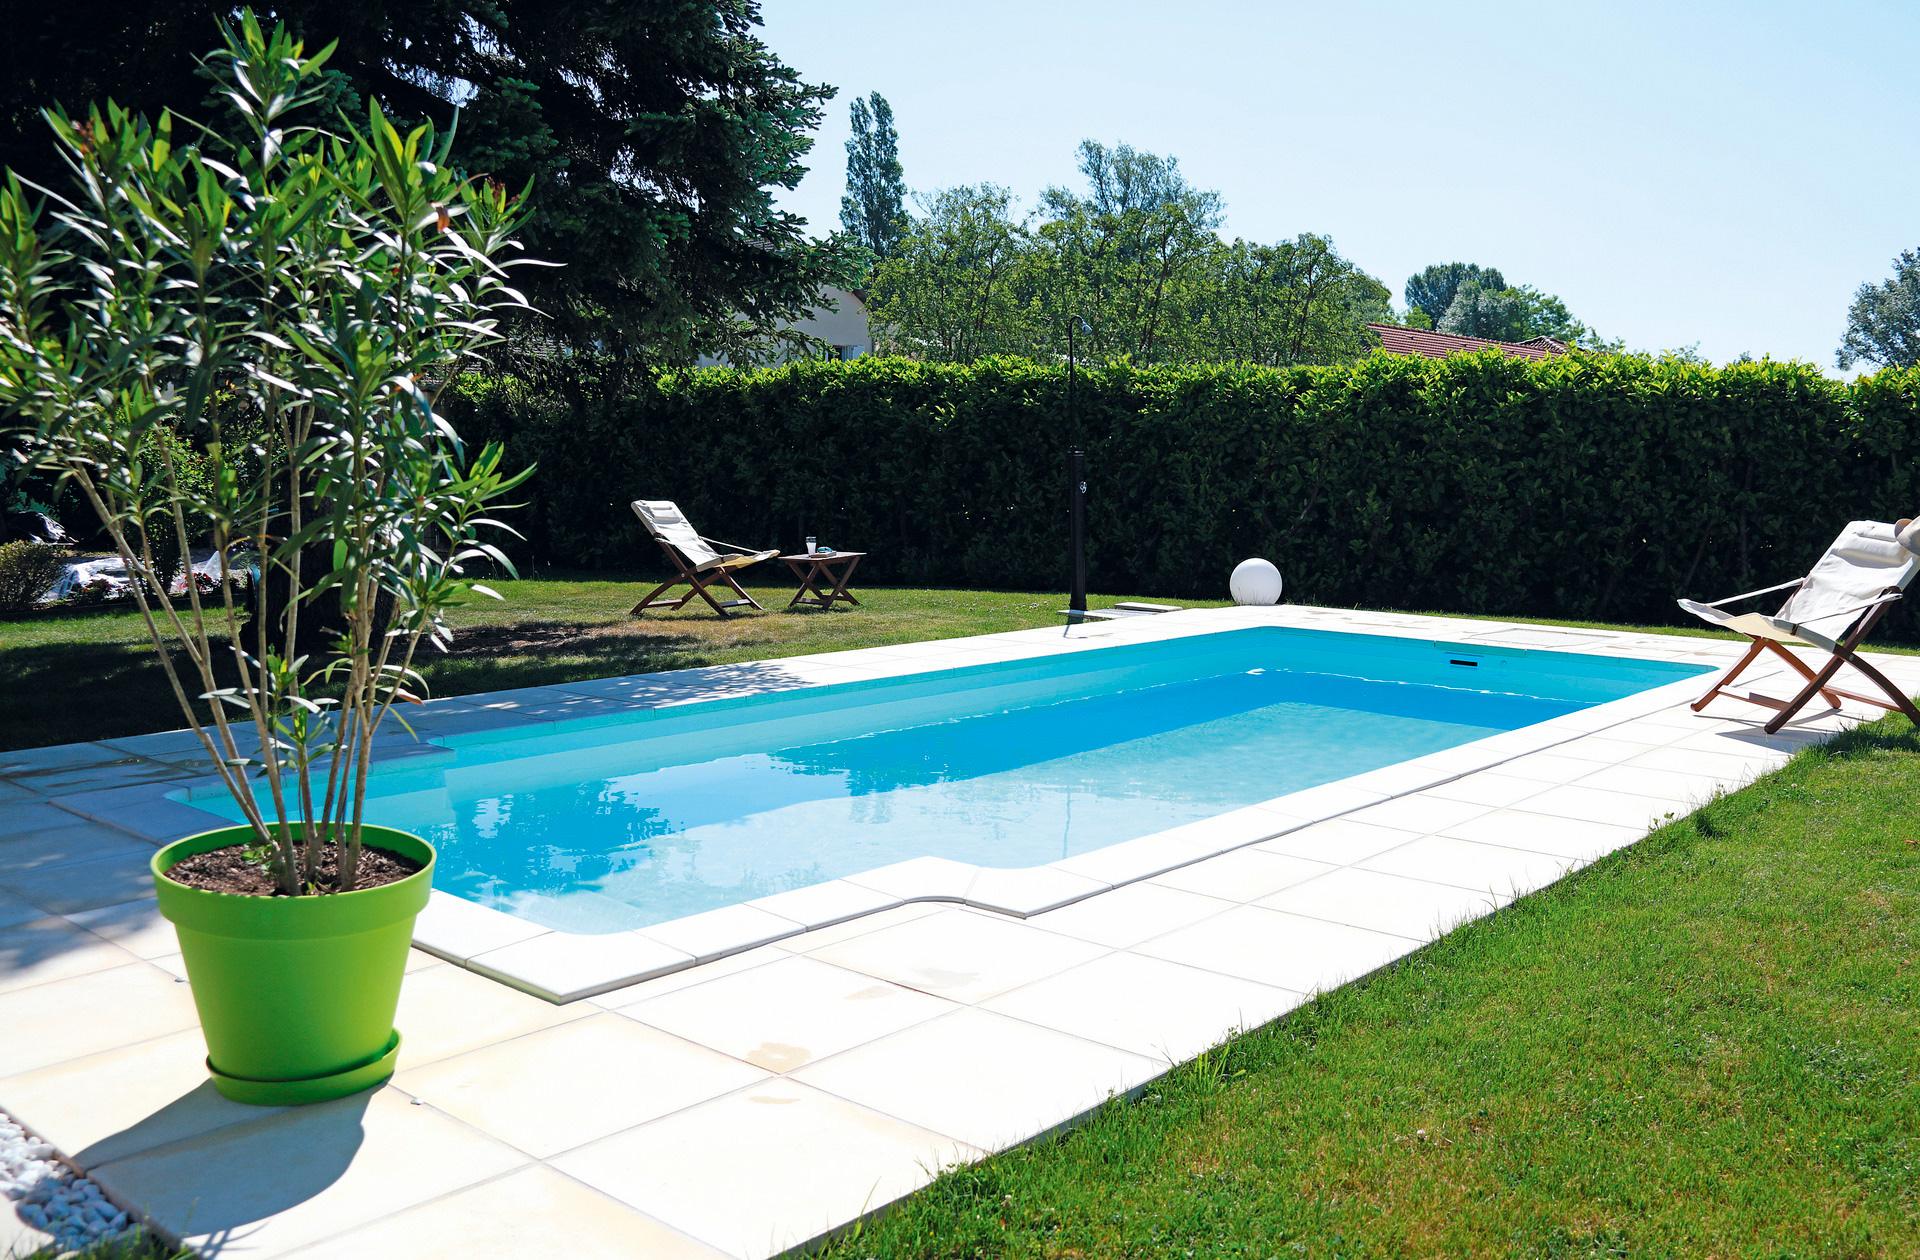 Berühmt Pool Bildgalerie: Swimmingpool Referenzen – Desjoyaux Pools CZ47